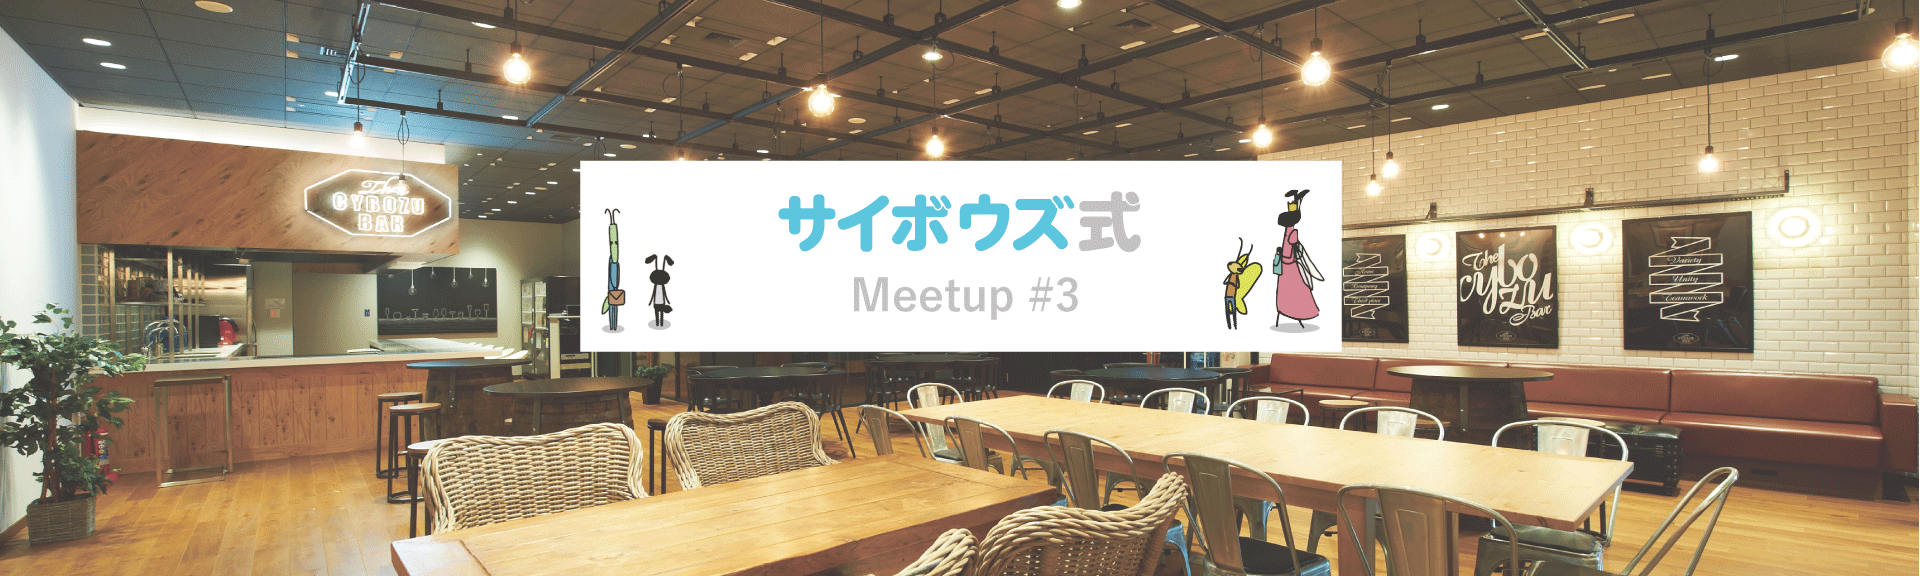 Meetup#3.png